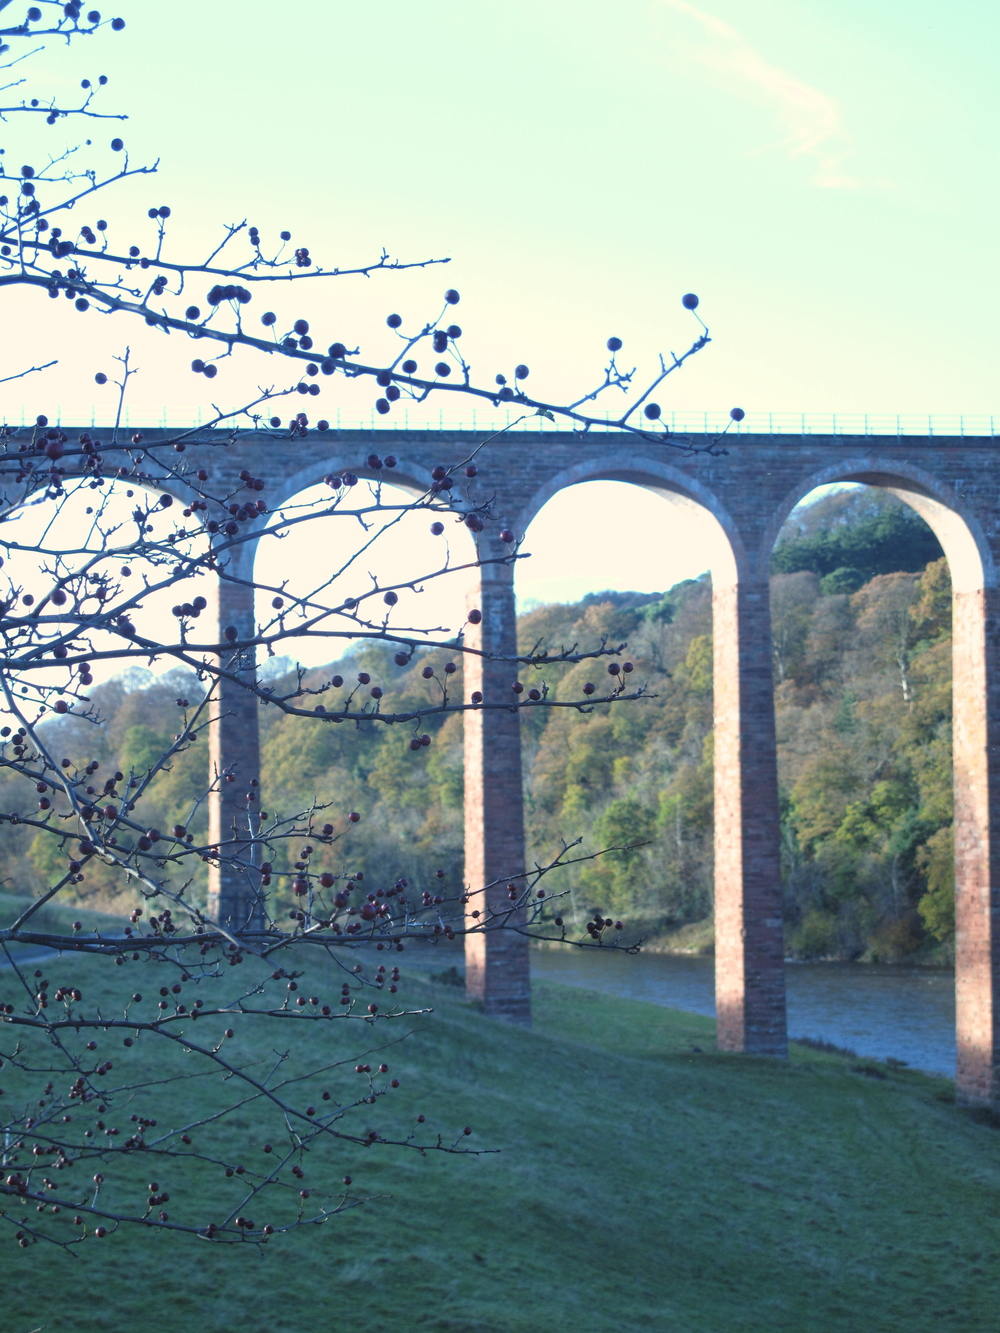 Old arched bridge over a river, Scotland.